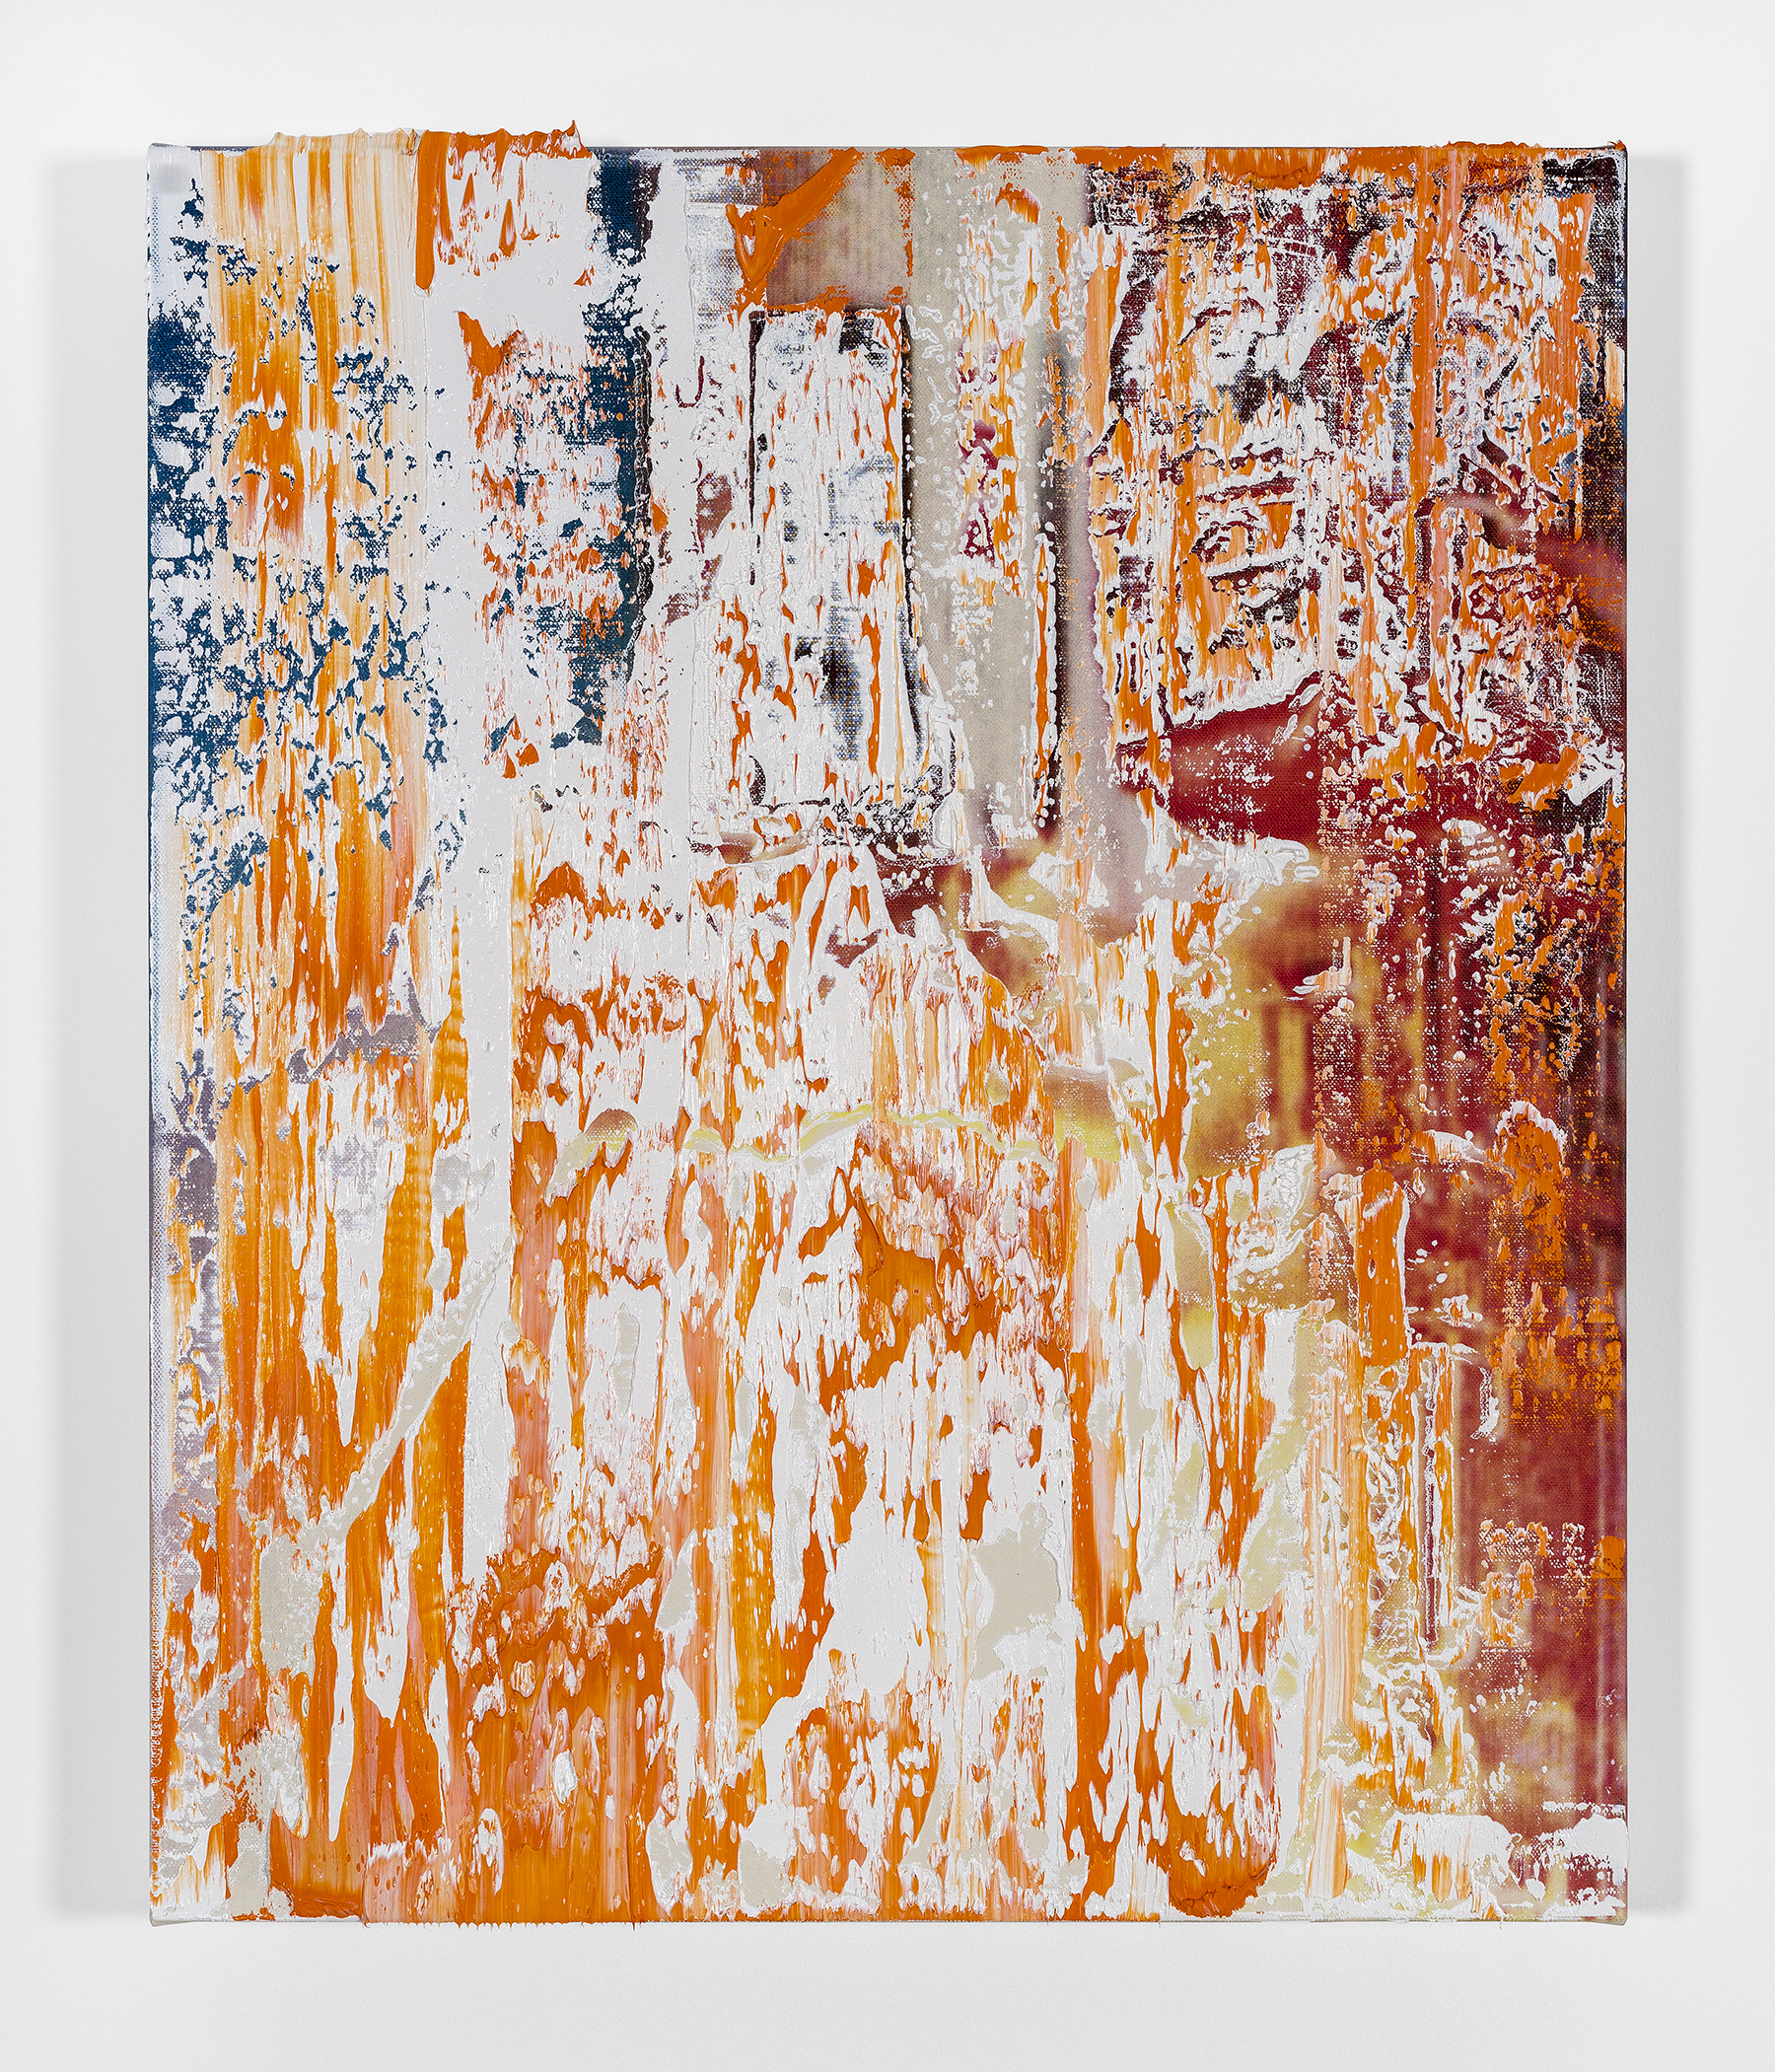 Michael Kagan  Boom Shakalaka 4, 2018  Oil on linen  24h x 20w in  60.96h x 50.80w cm  MK018